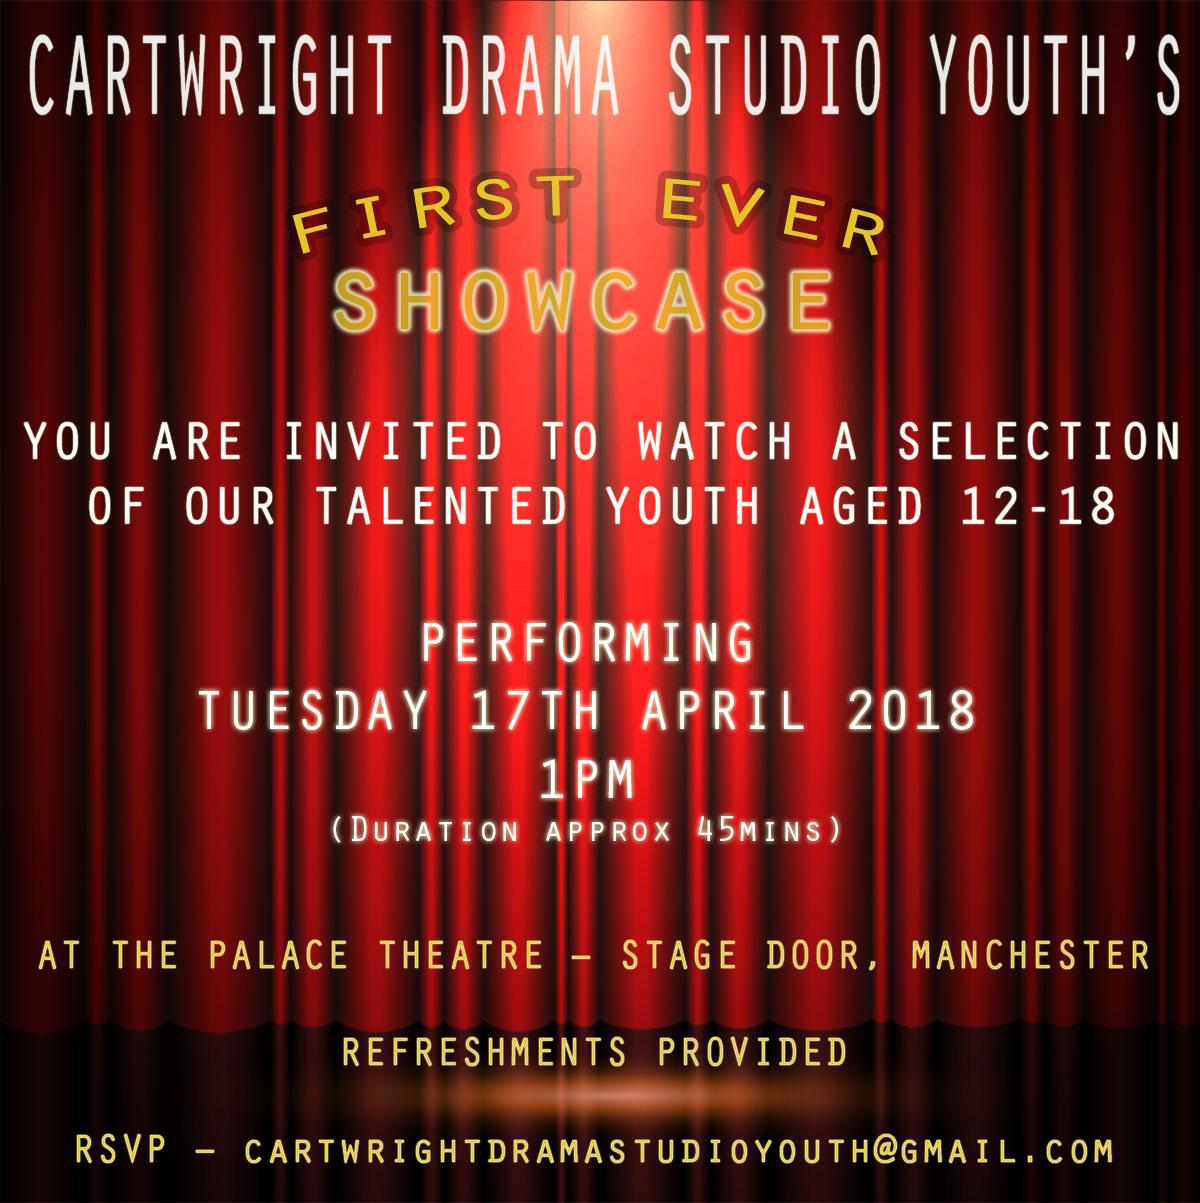 Cartwright Drama Studio Youth Showcase.